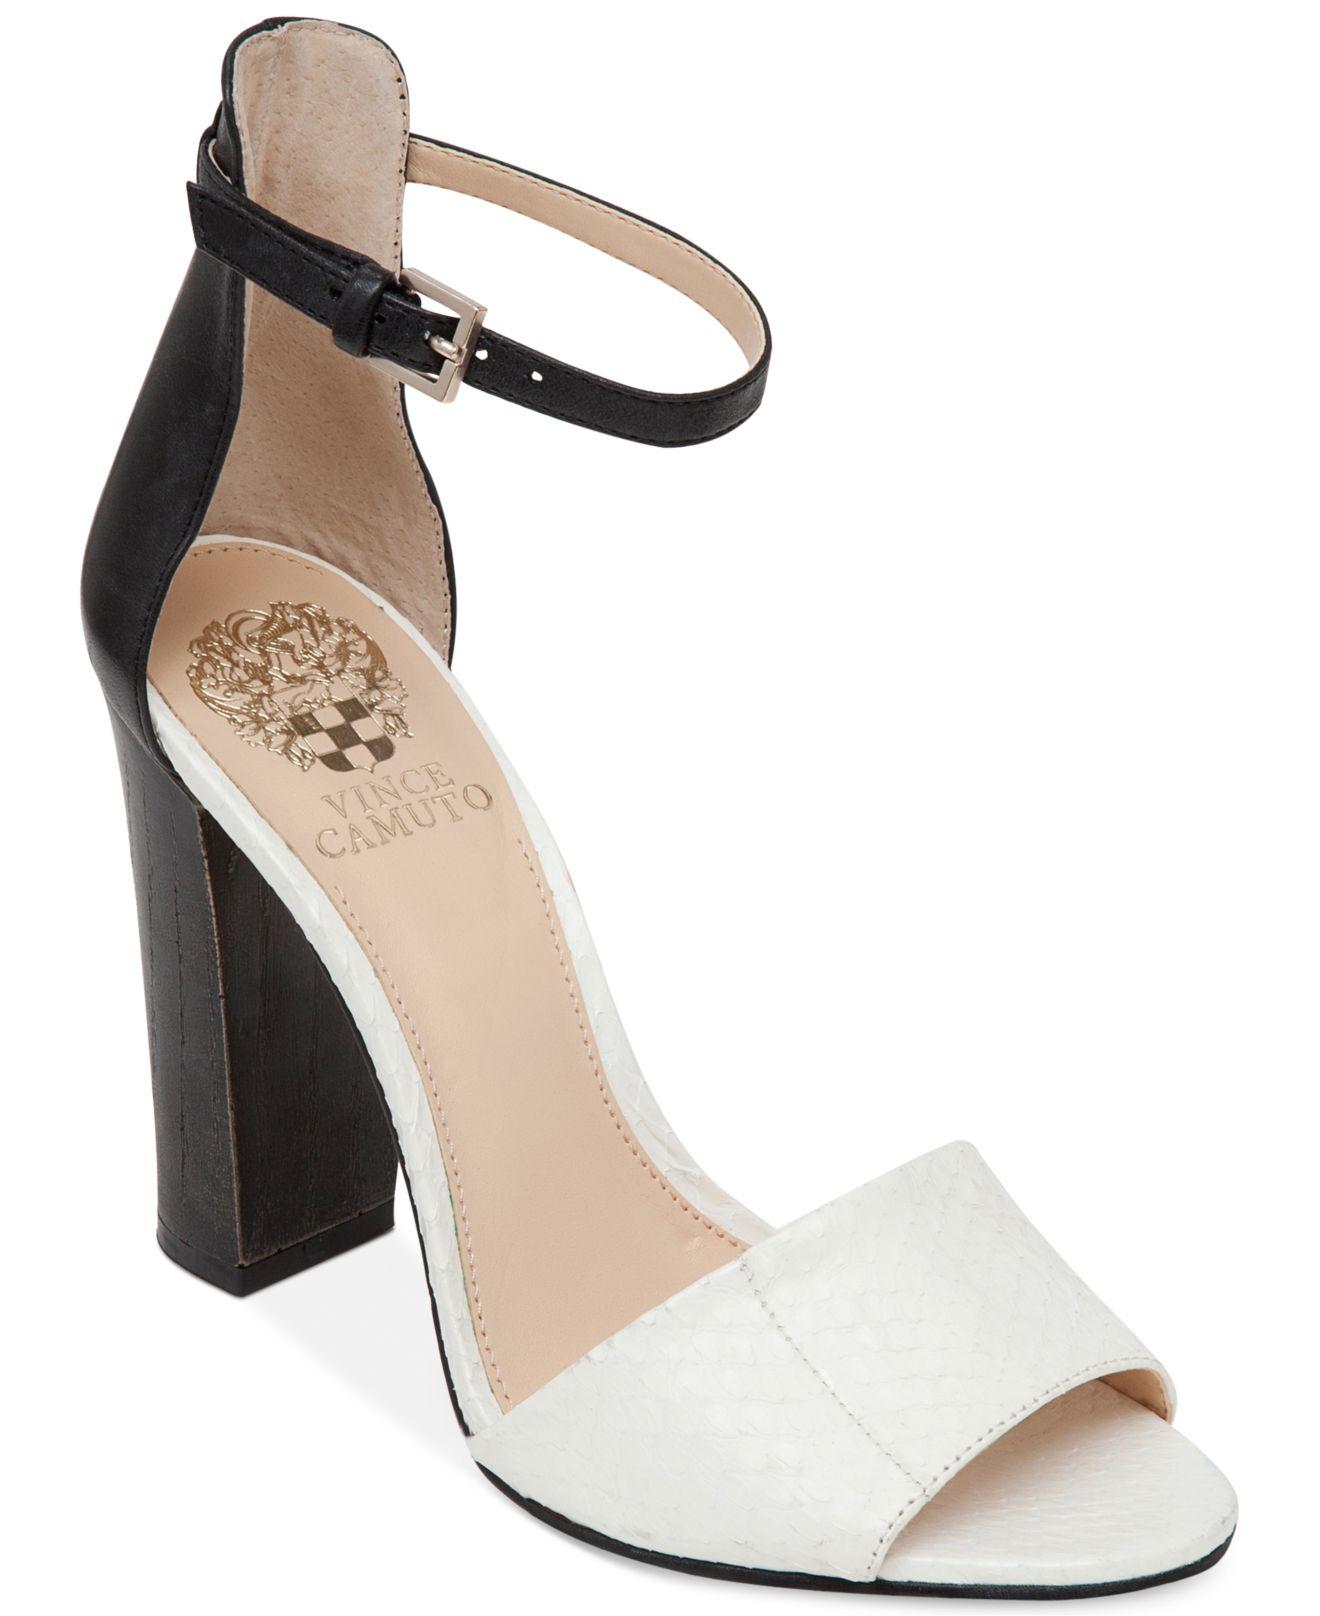 5b57d5e19cd6 Lyst - Vince Camuto Velenza Block Heel Ankle Strap Dress Sandals in ...